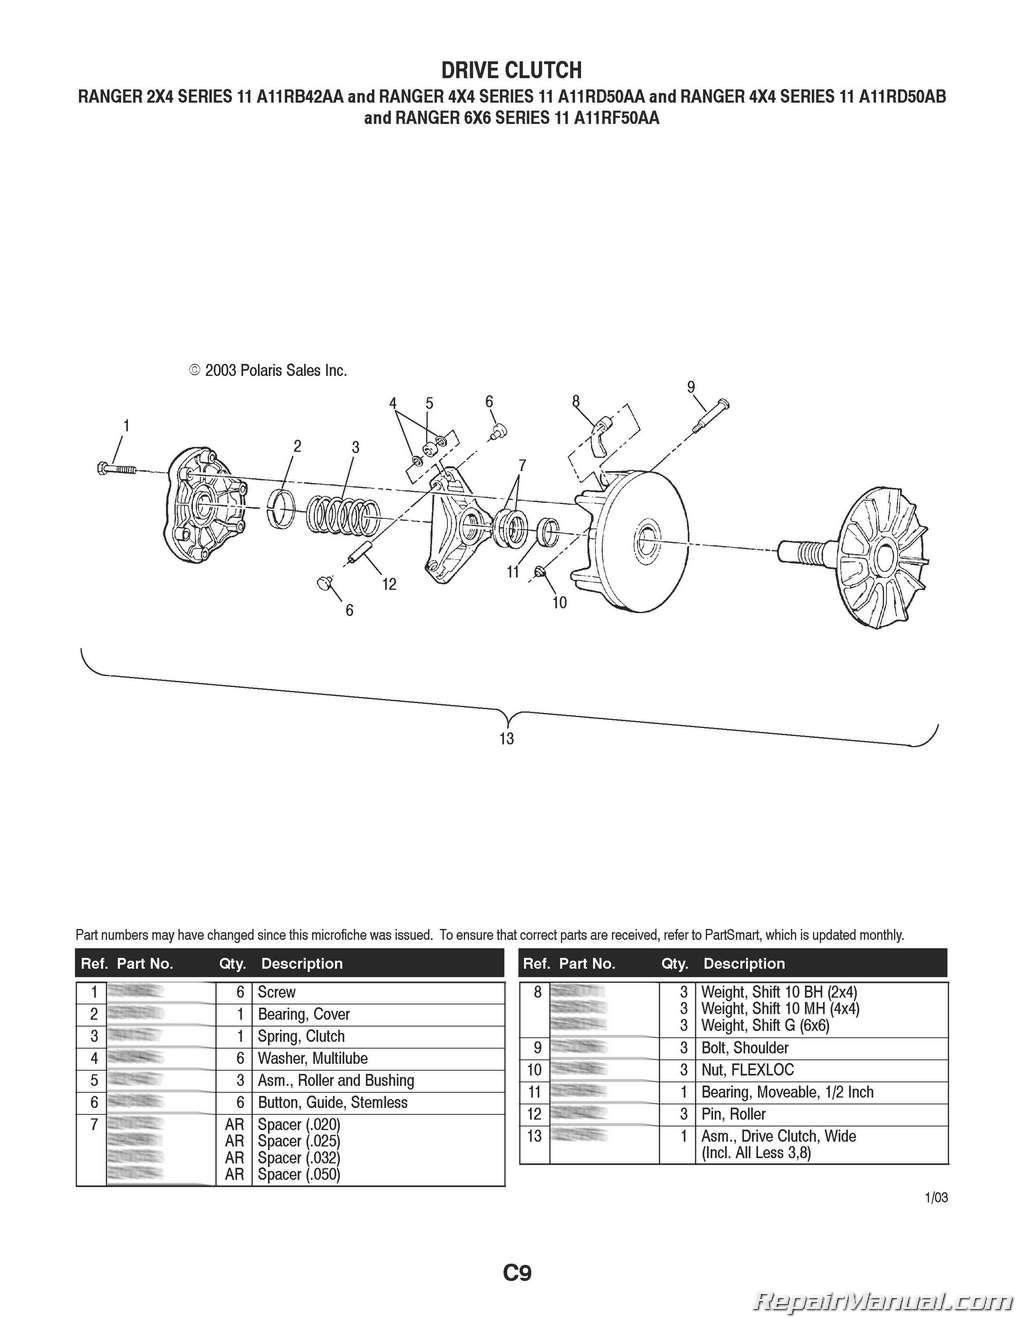 Parts Manual For Polaris 6x6 Ranger Rotax 447 Wiring Diagram 2 4 6 Series 11 Rh Repairmanual Com 500 Specifications